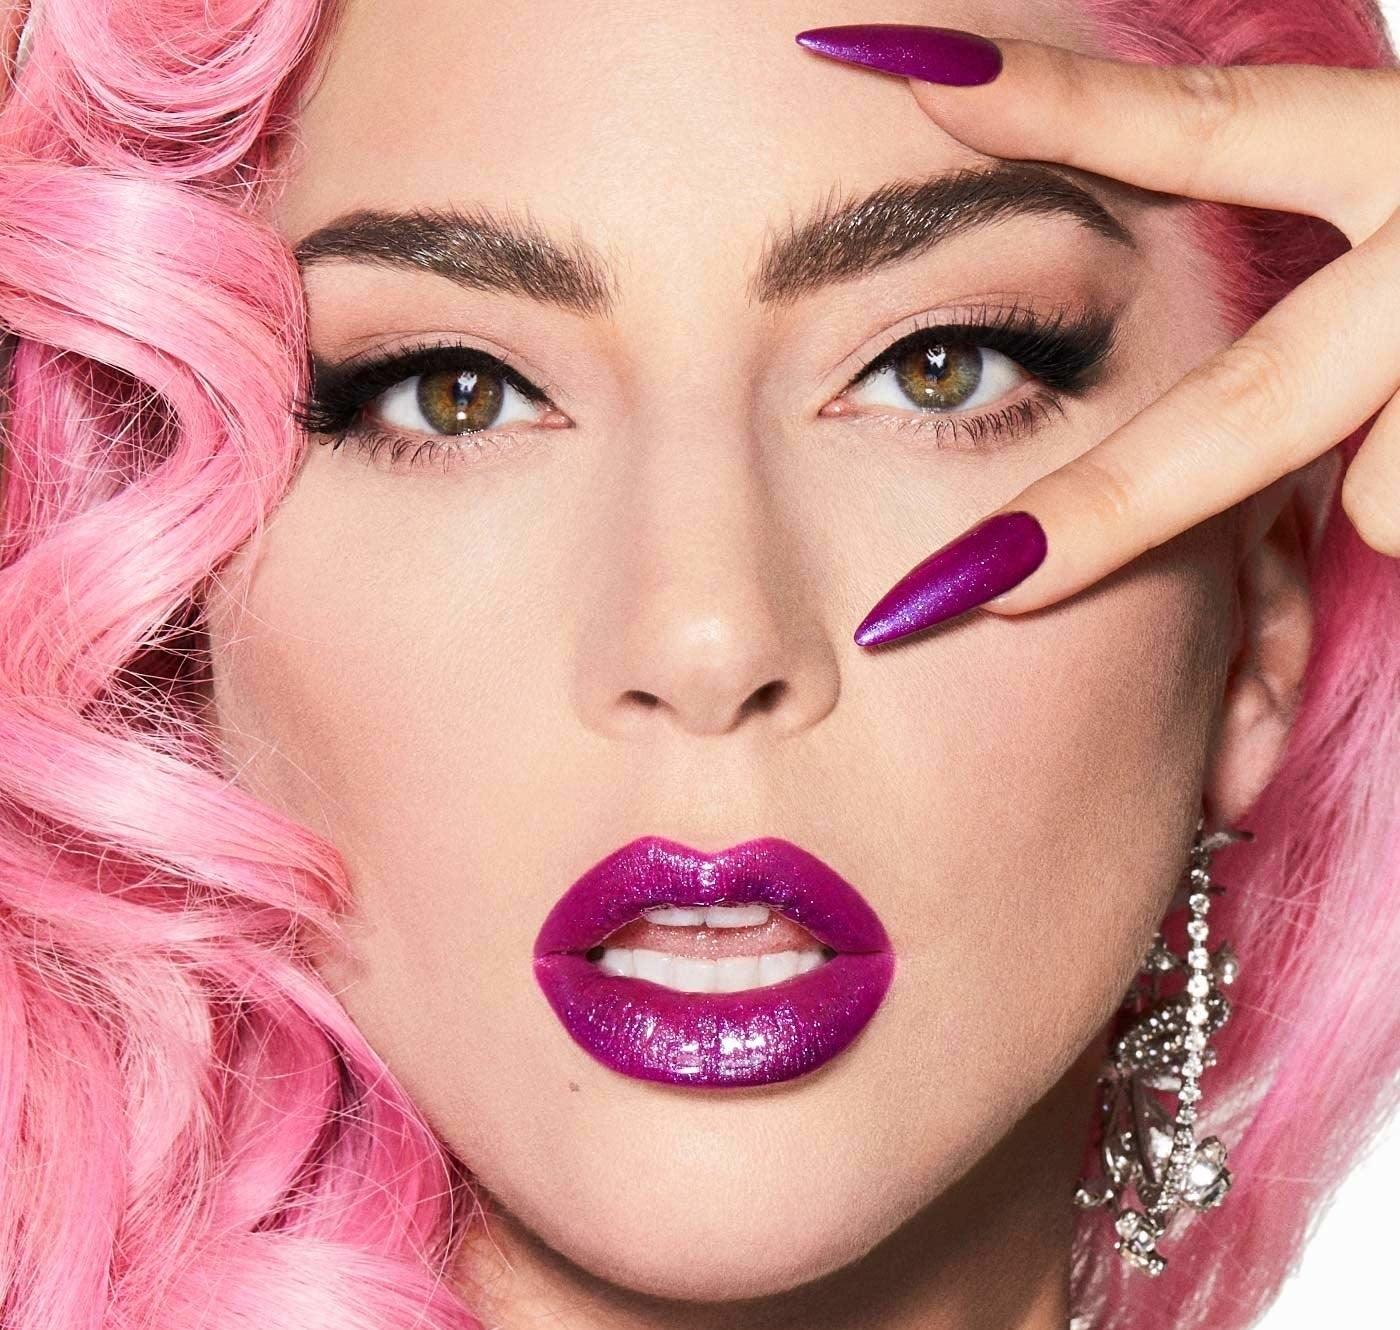 lady gaga wearing bright purple tinted lip gloss